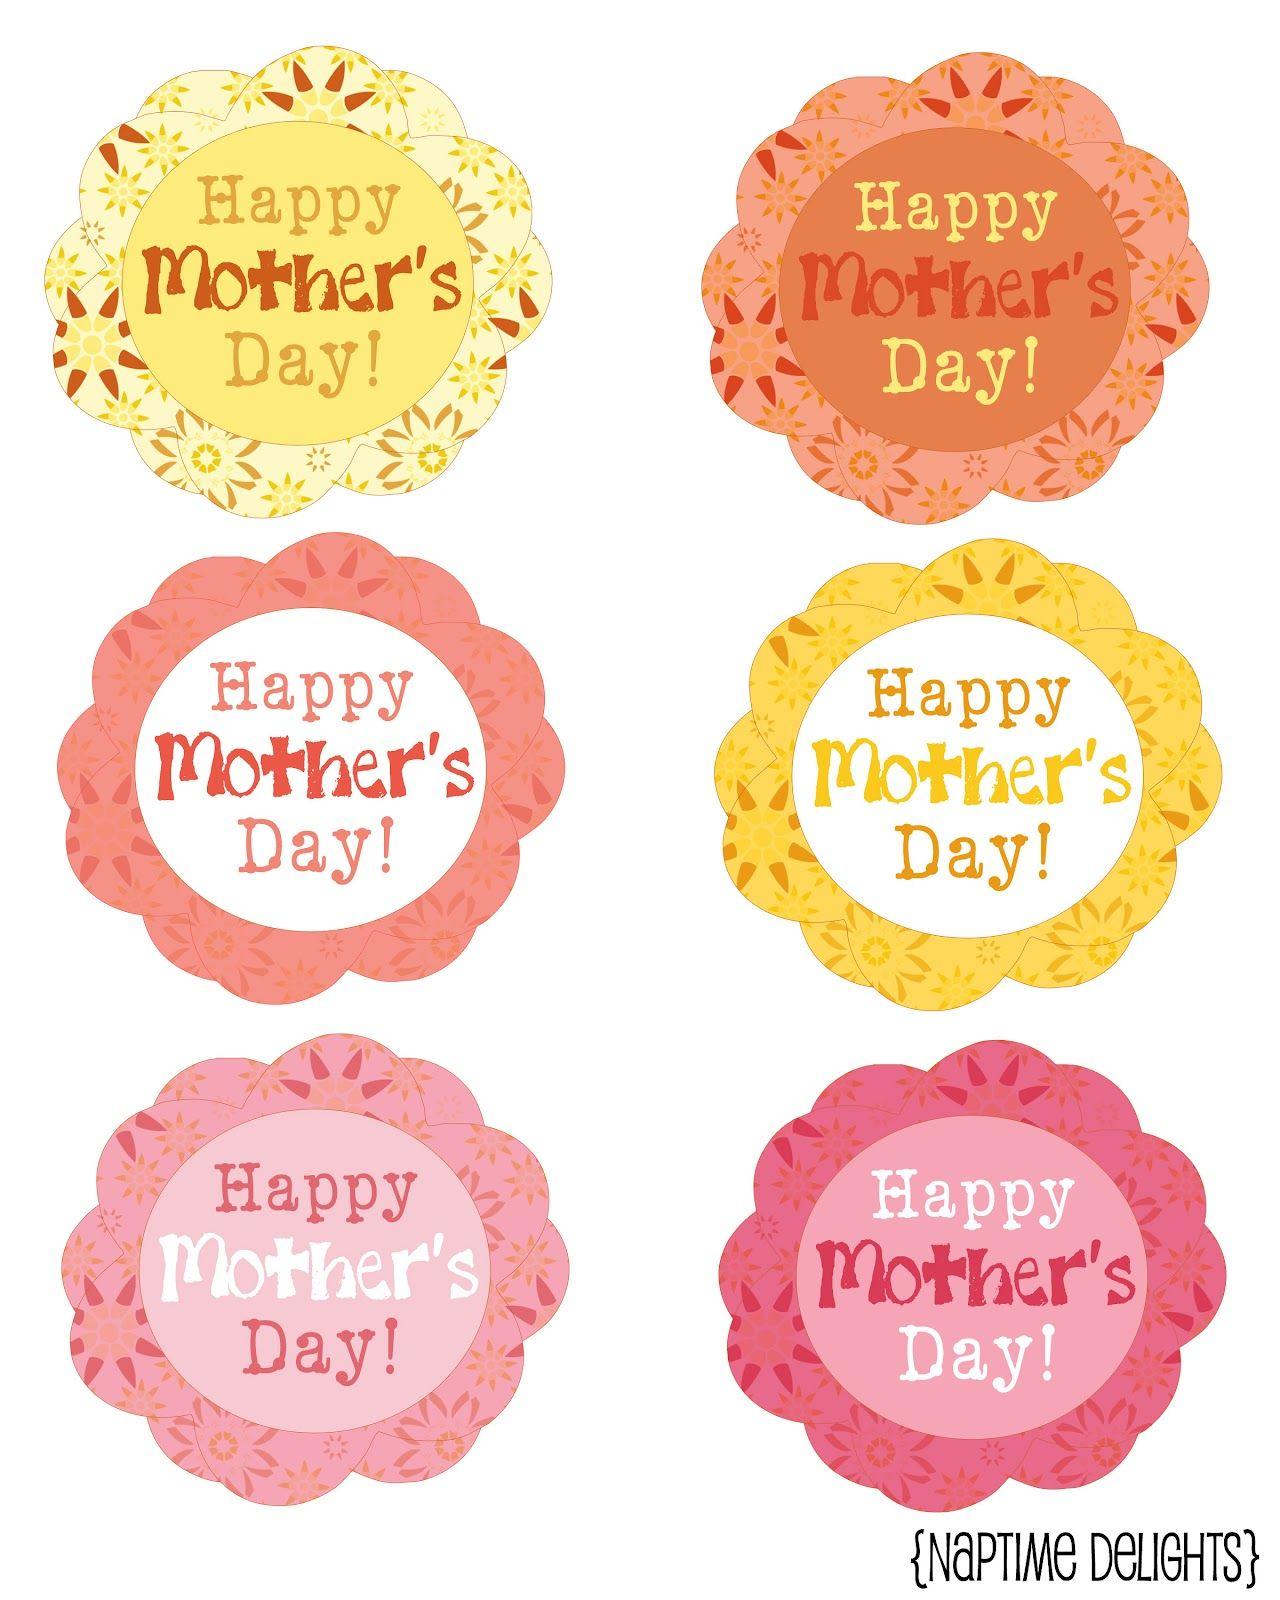 mother 39 s day gift tag mother 39 s day mother 39 s day printables preschool mothers day gifts. Black Bedroom Furniture Sets. Home Design Ideas